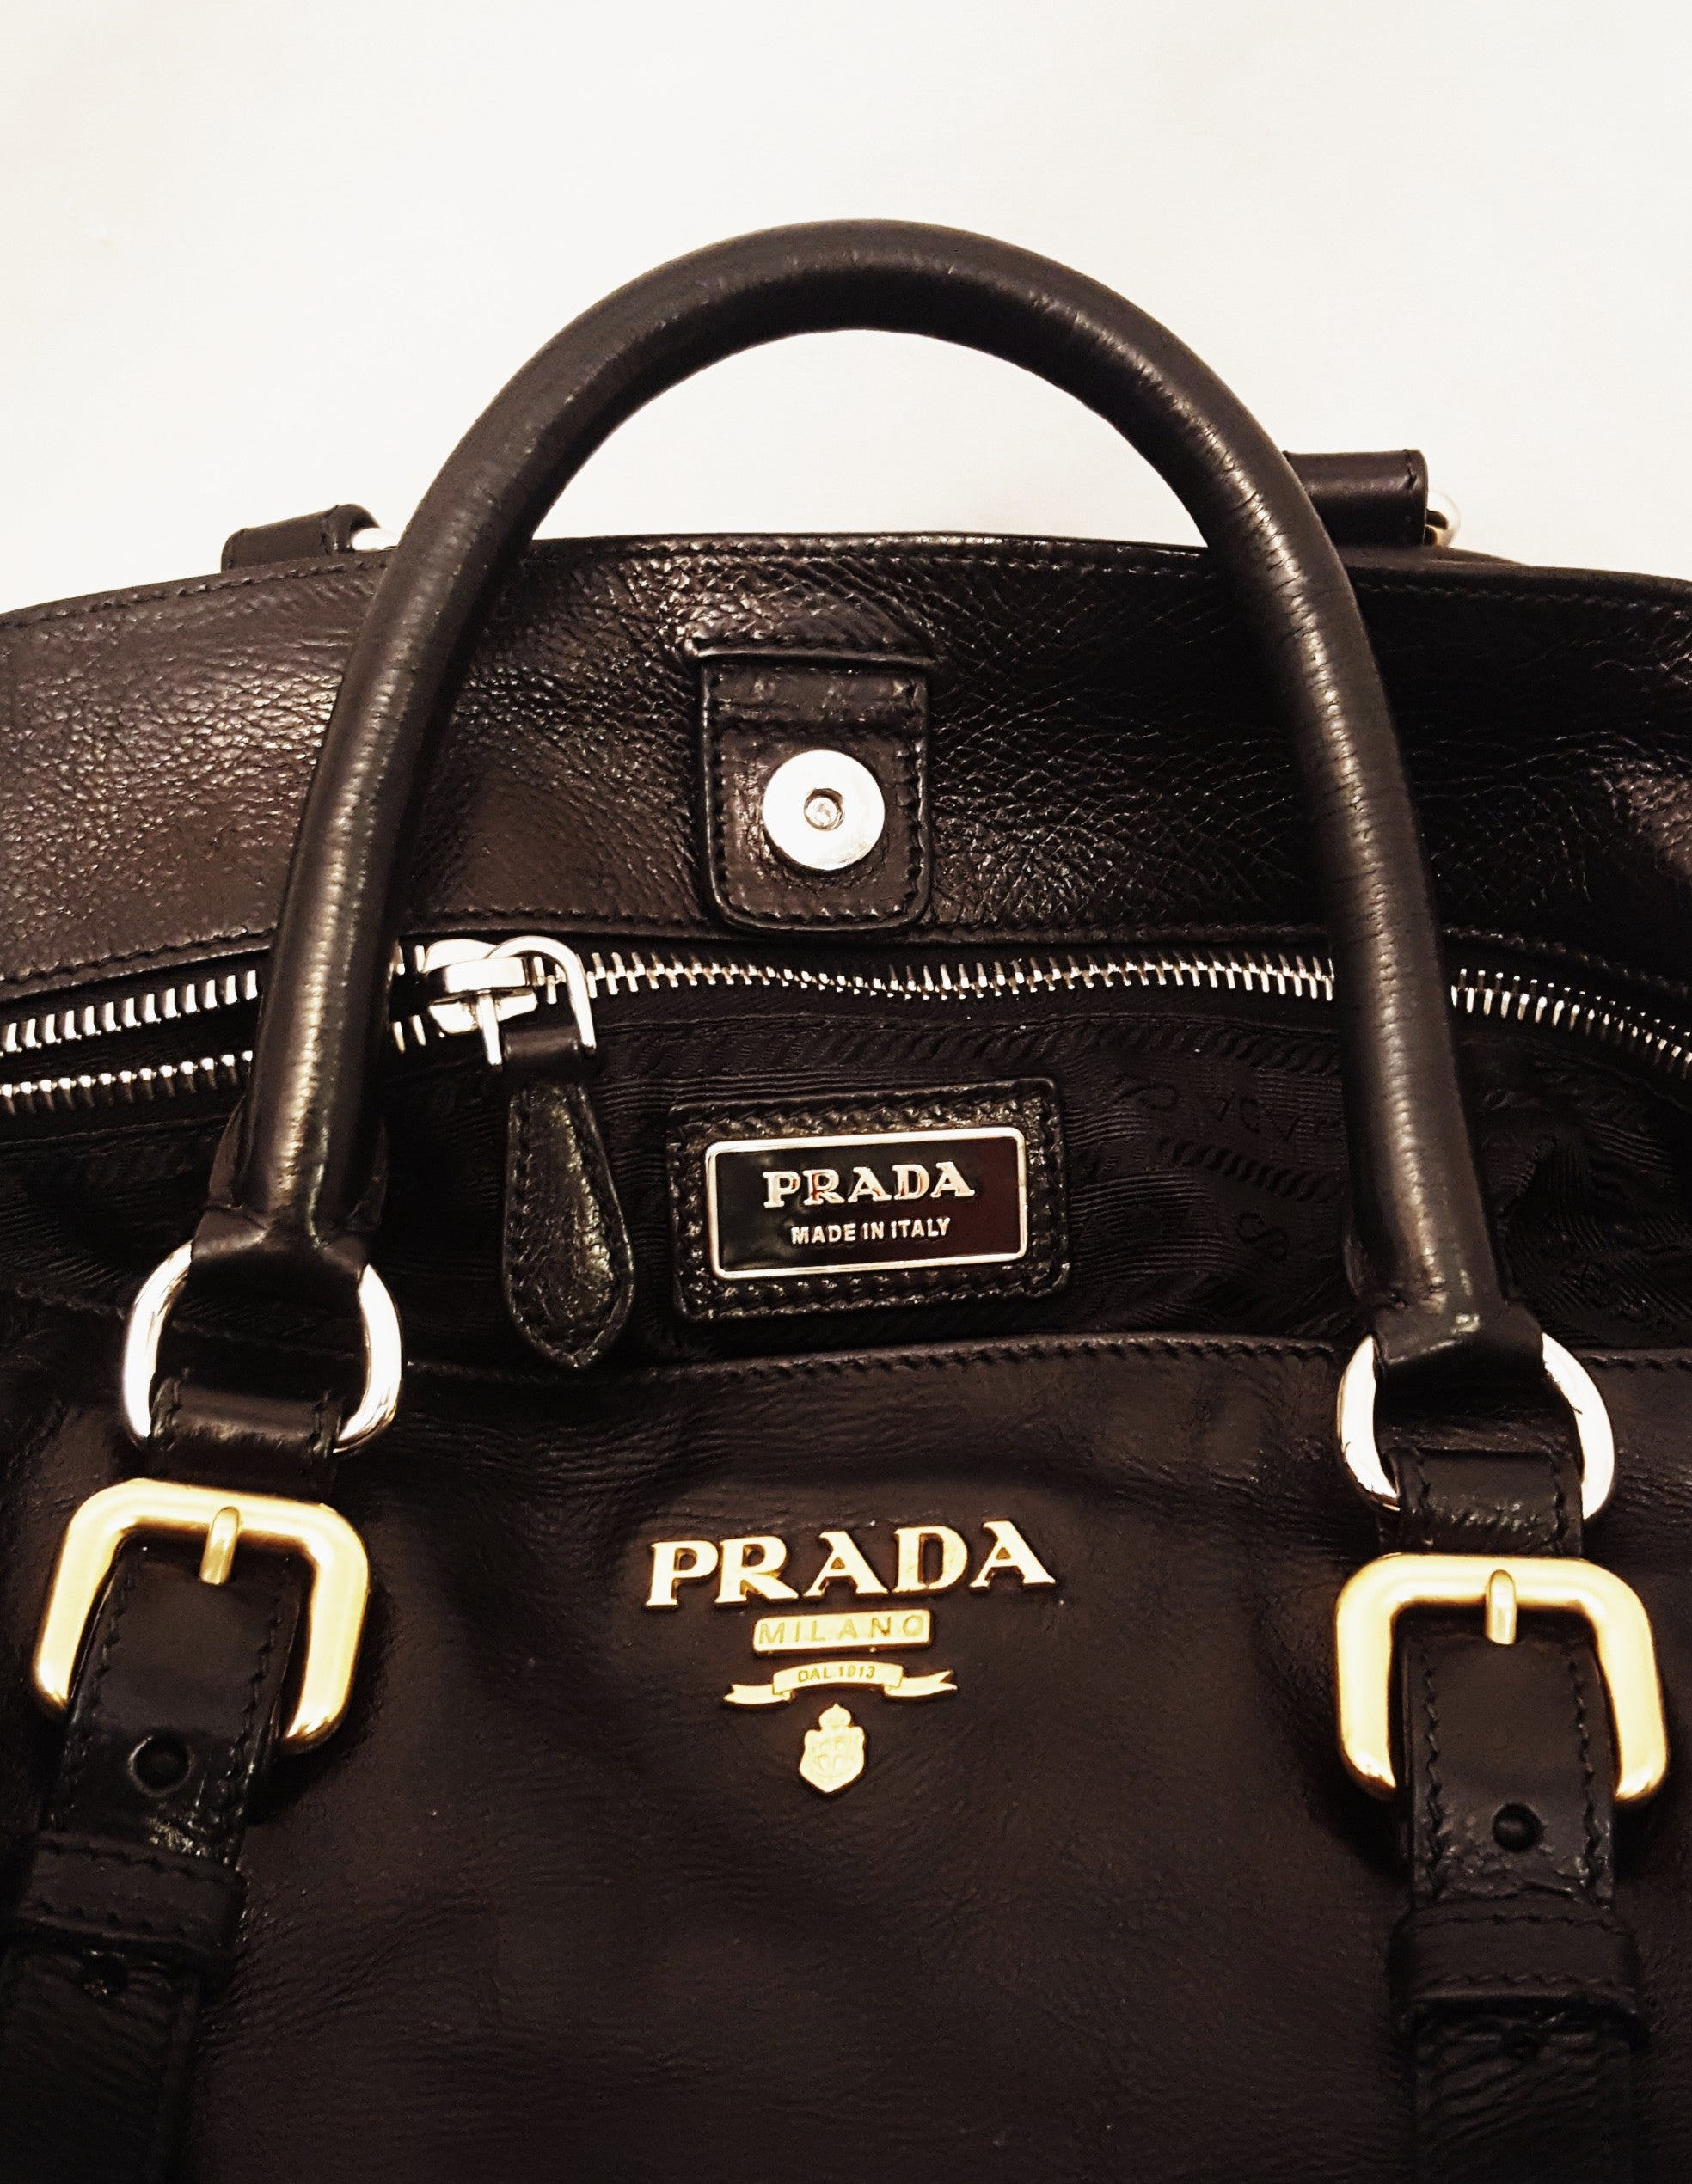 63e9d6cd389e ... free shipping prada black leather daino tote bag at 1stdibs fc8ba a4375